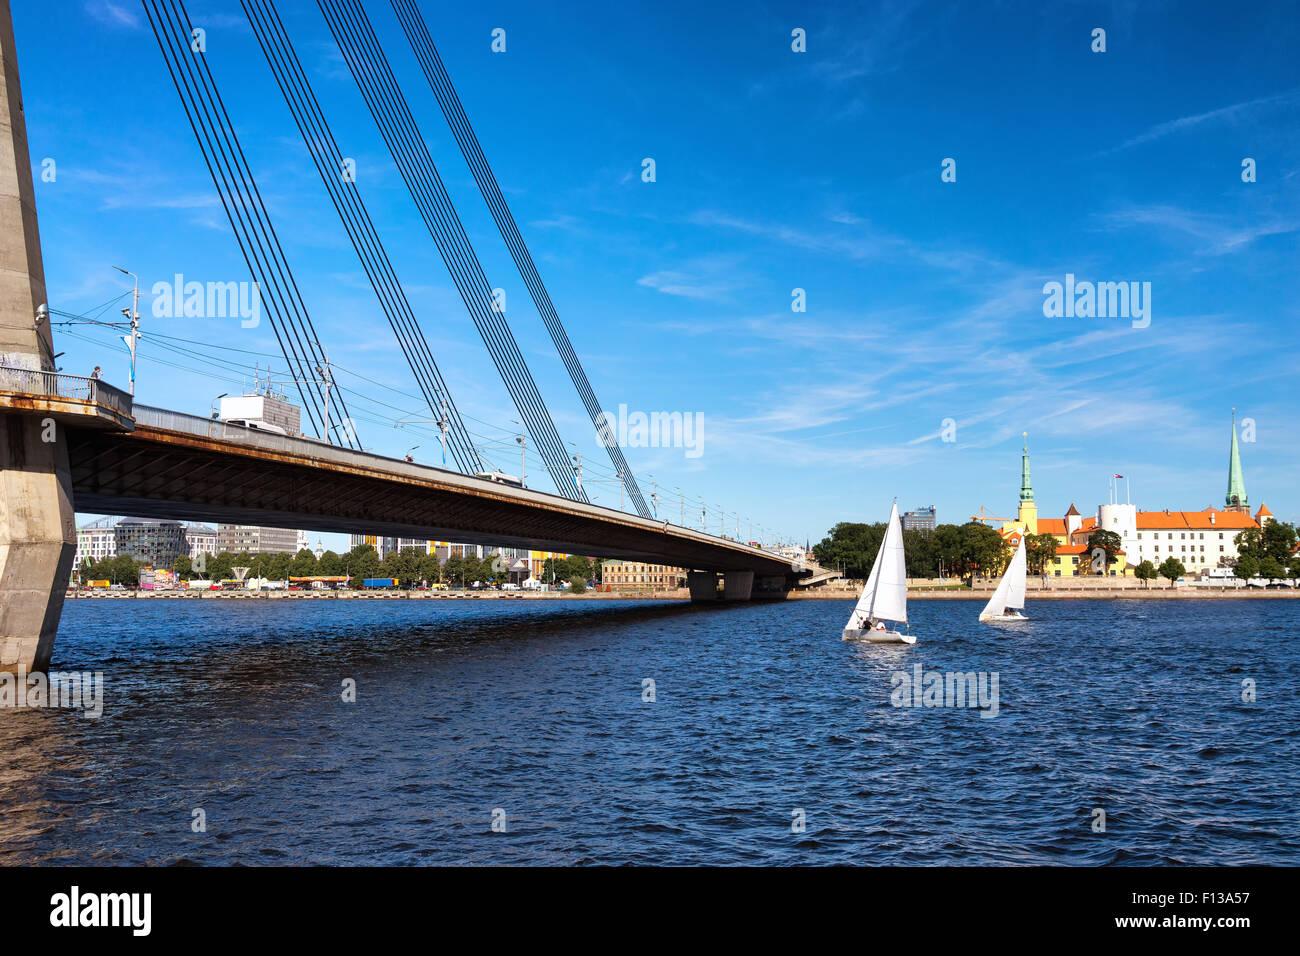 Latvia. Riga. Sailboat on the Daugava River near the cable-stayed bridge and the palace of the President of Latvia - Stock Image